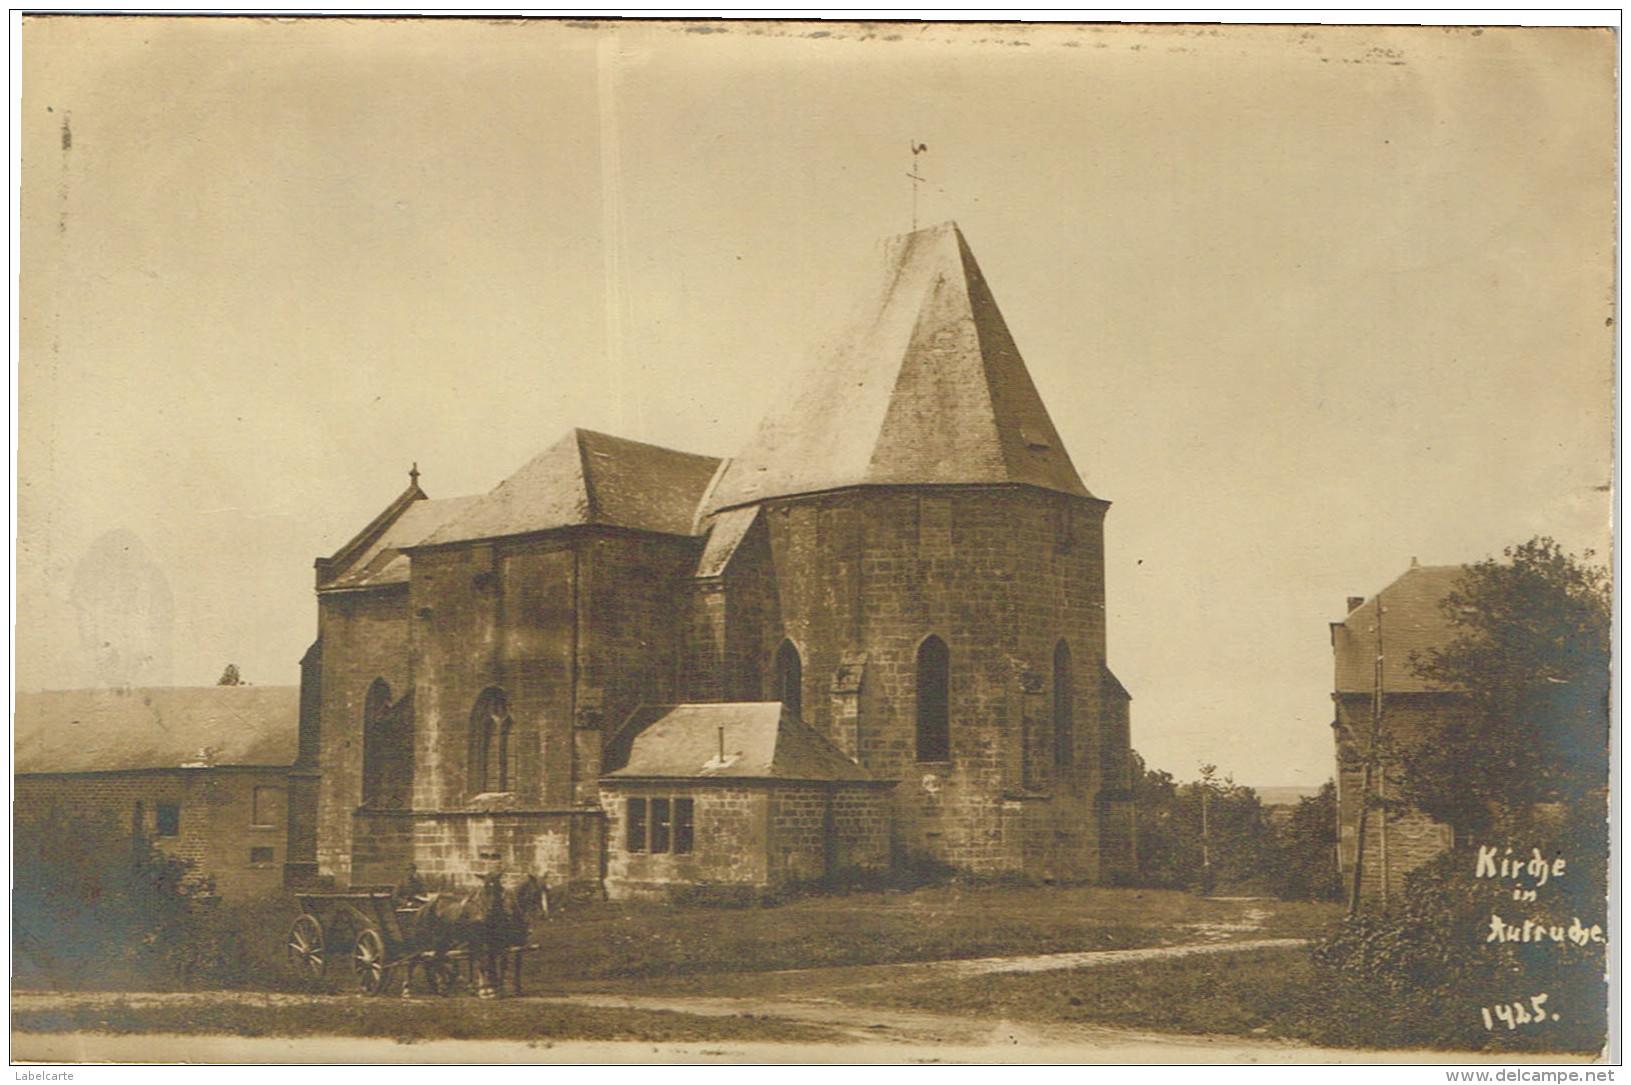 ARDENNES 08.AUTRUCHE CARTE PHOTO KIRCHE 1915 - France